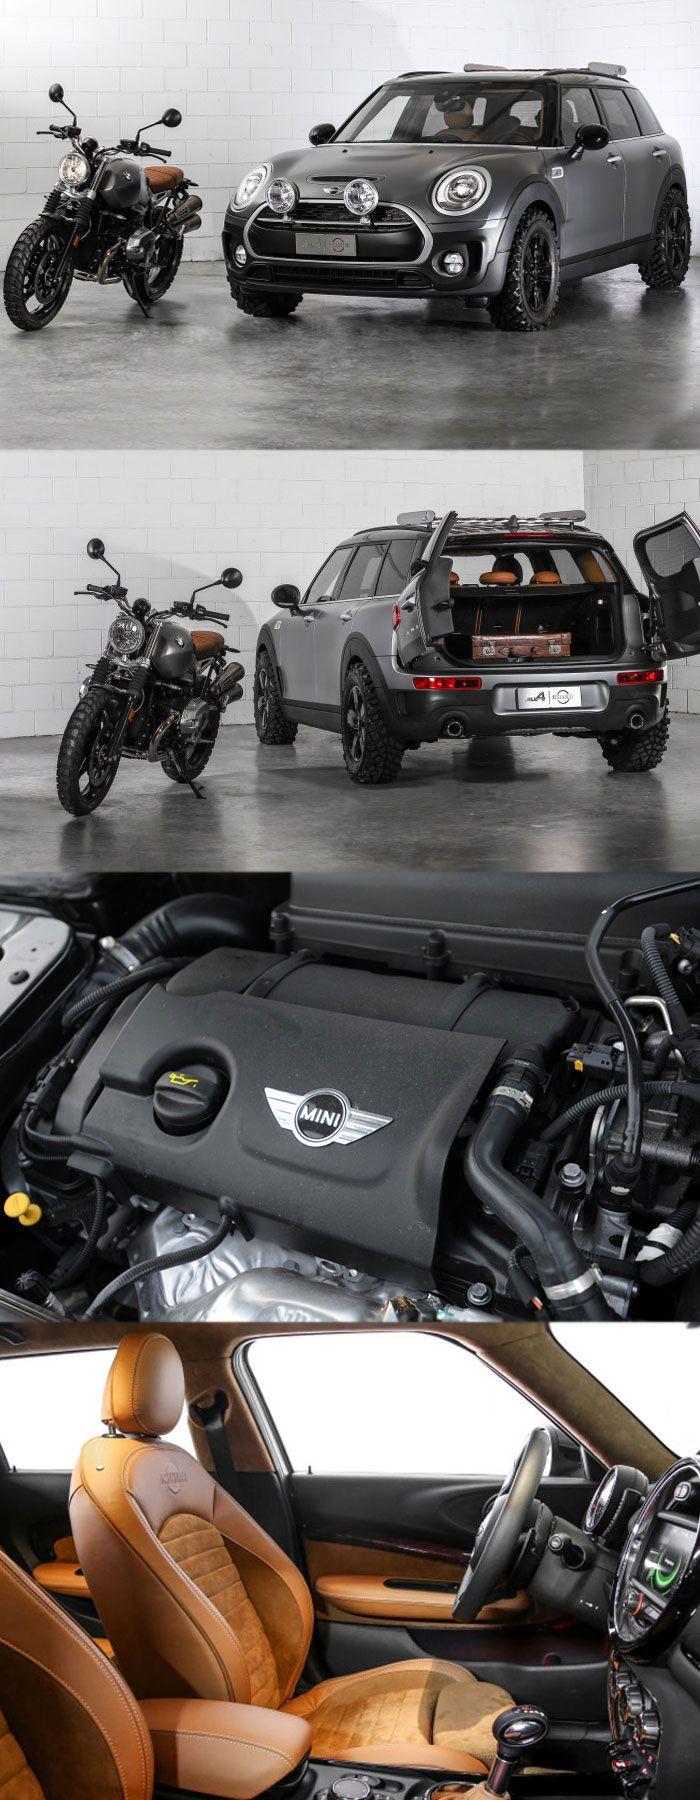 MINI Clubman ALL4 Scrambler to Resemble a BMW R nineT Scrambler Get more details at: https://pamelaukcarengines.wordpress.com/2016/06/15/mini-clubman-all4-scrambler-to-resemble-a-bmw-r-ninet-scrambler/